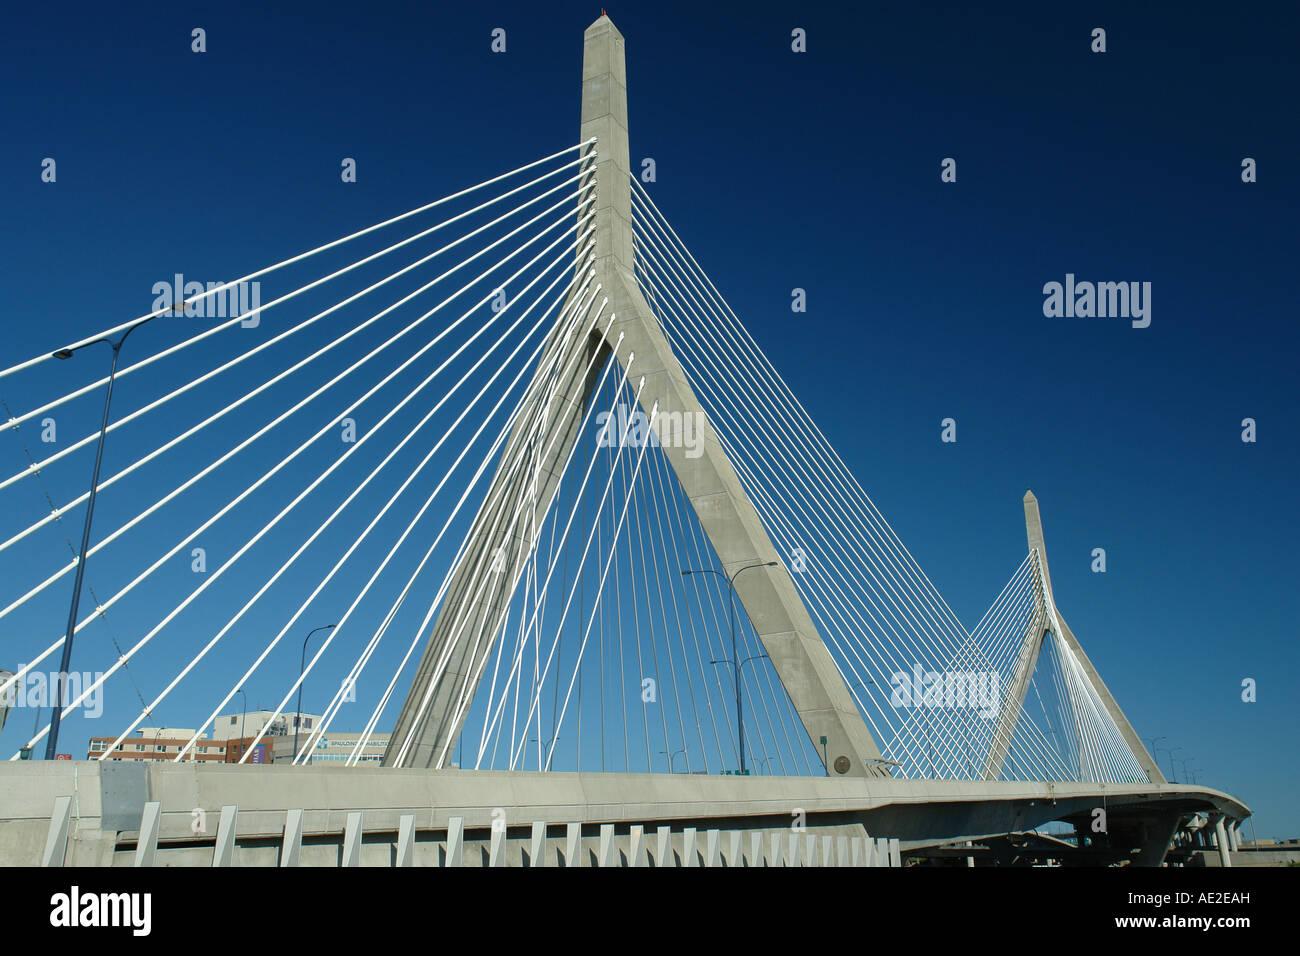 The controversy over charles river bridge